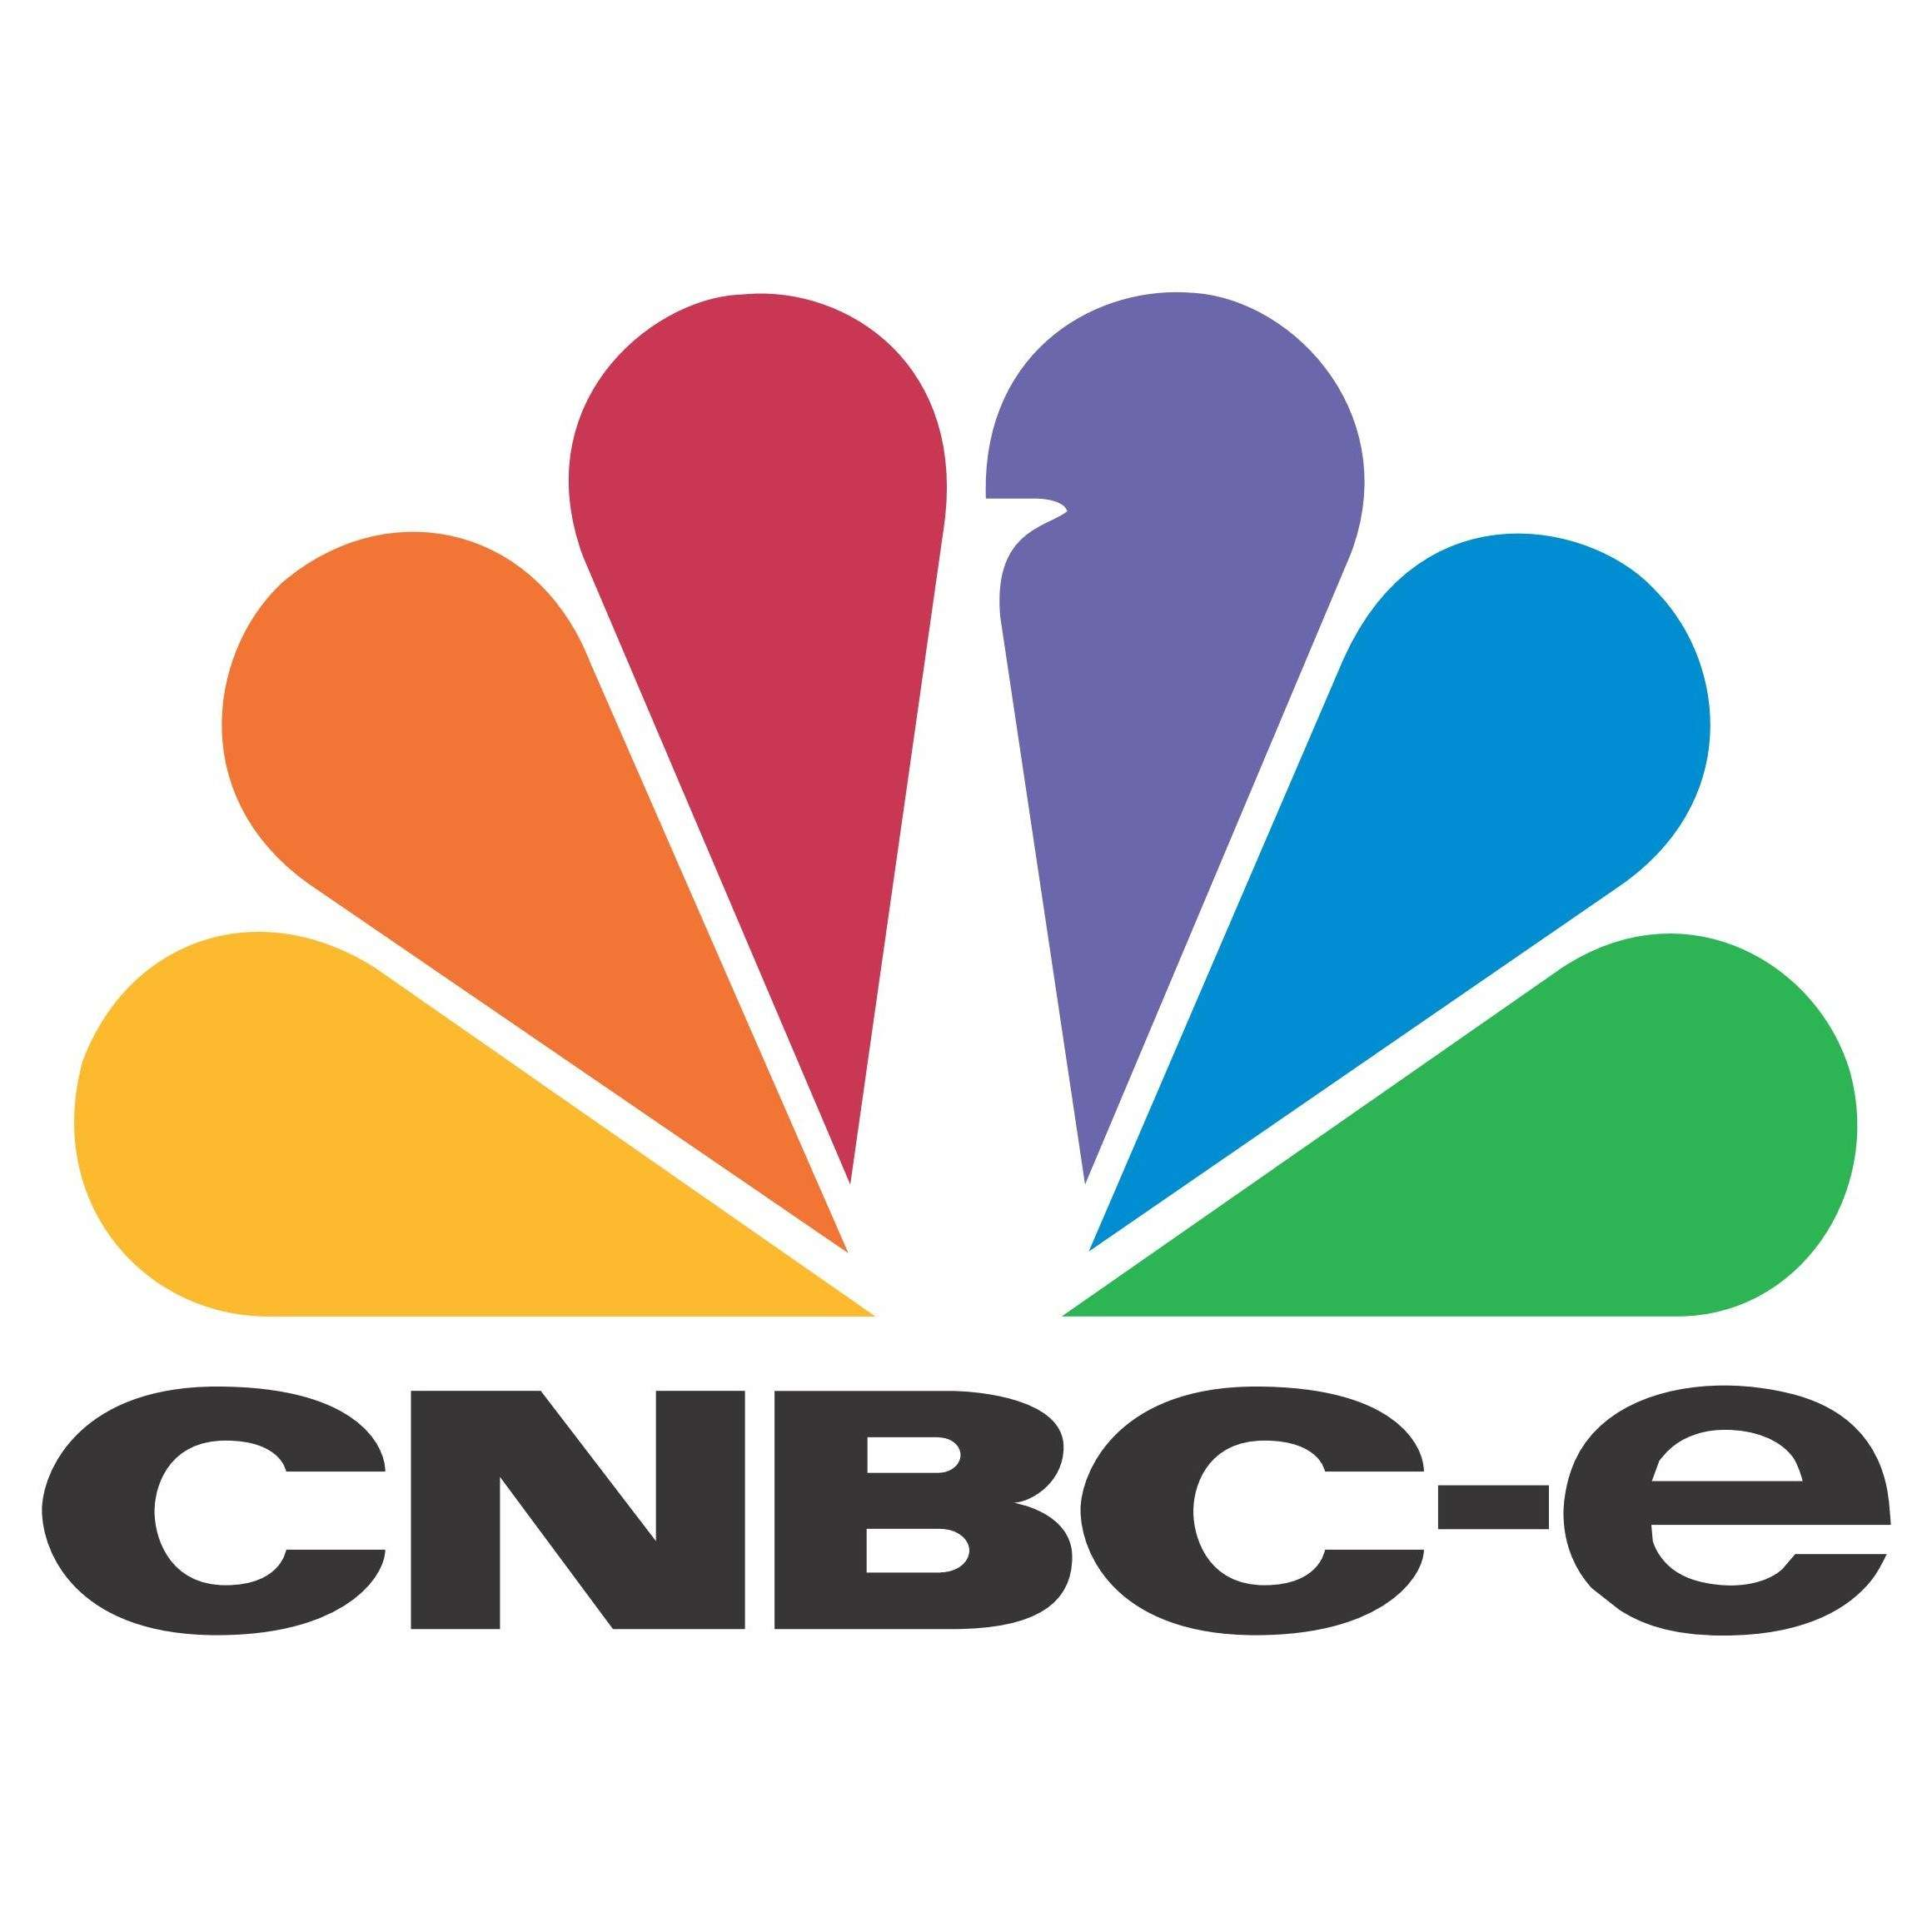 CNBC e Logo png